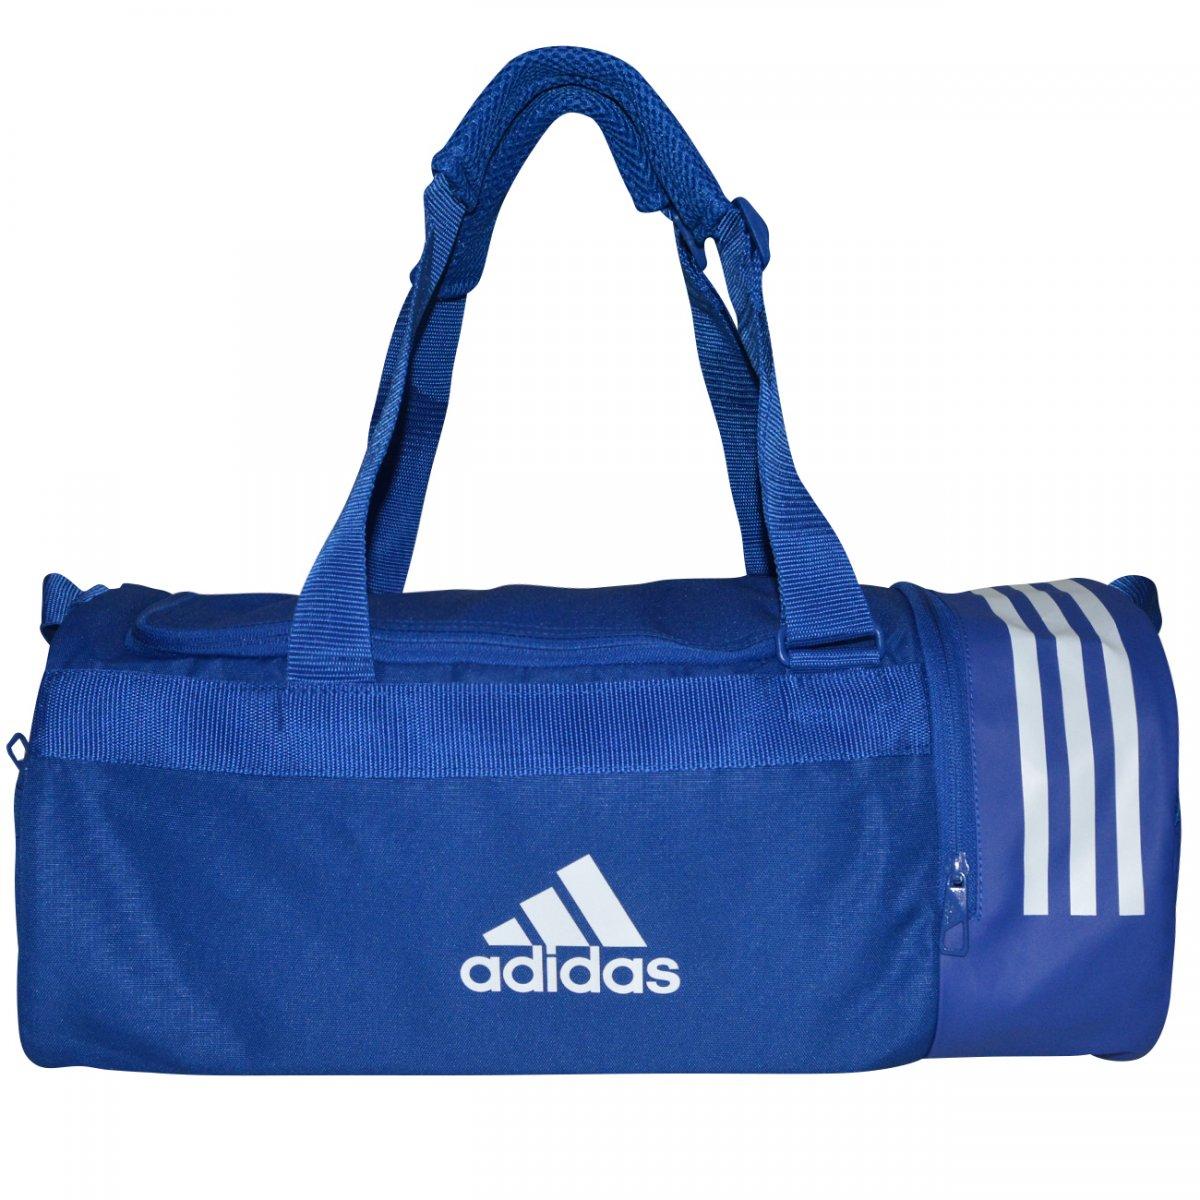 9fa9306c9 Bolsa Adidas CVRT 3S Duf S DM7784 - Royal/branco - Chuteira Nike, Adidas.  Sandalias Femininas. Sandy Calçados